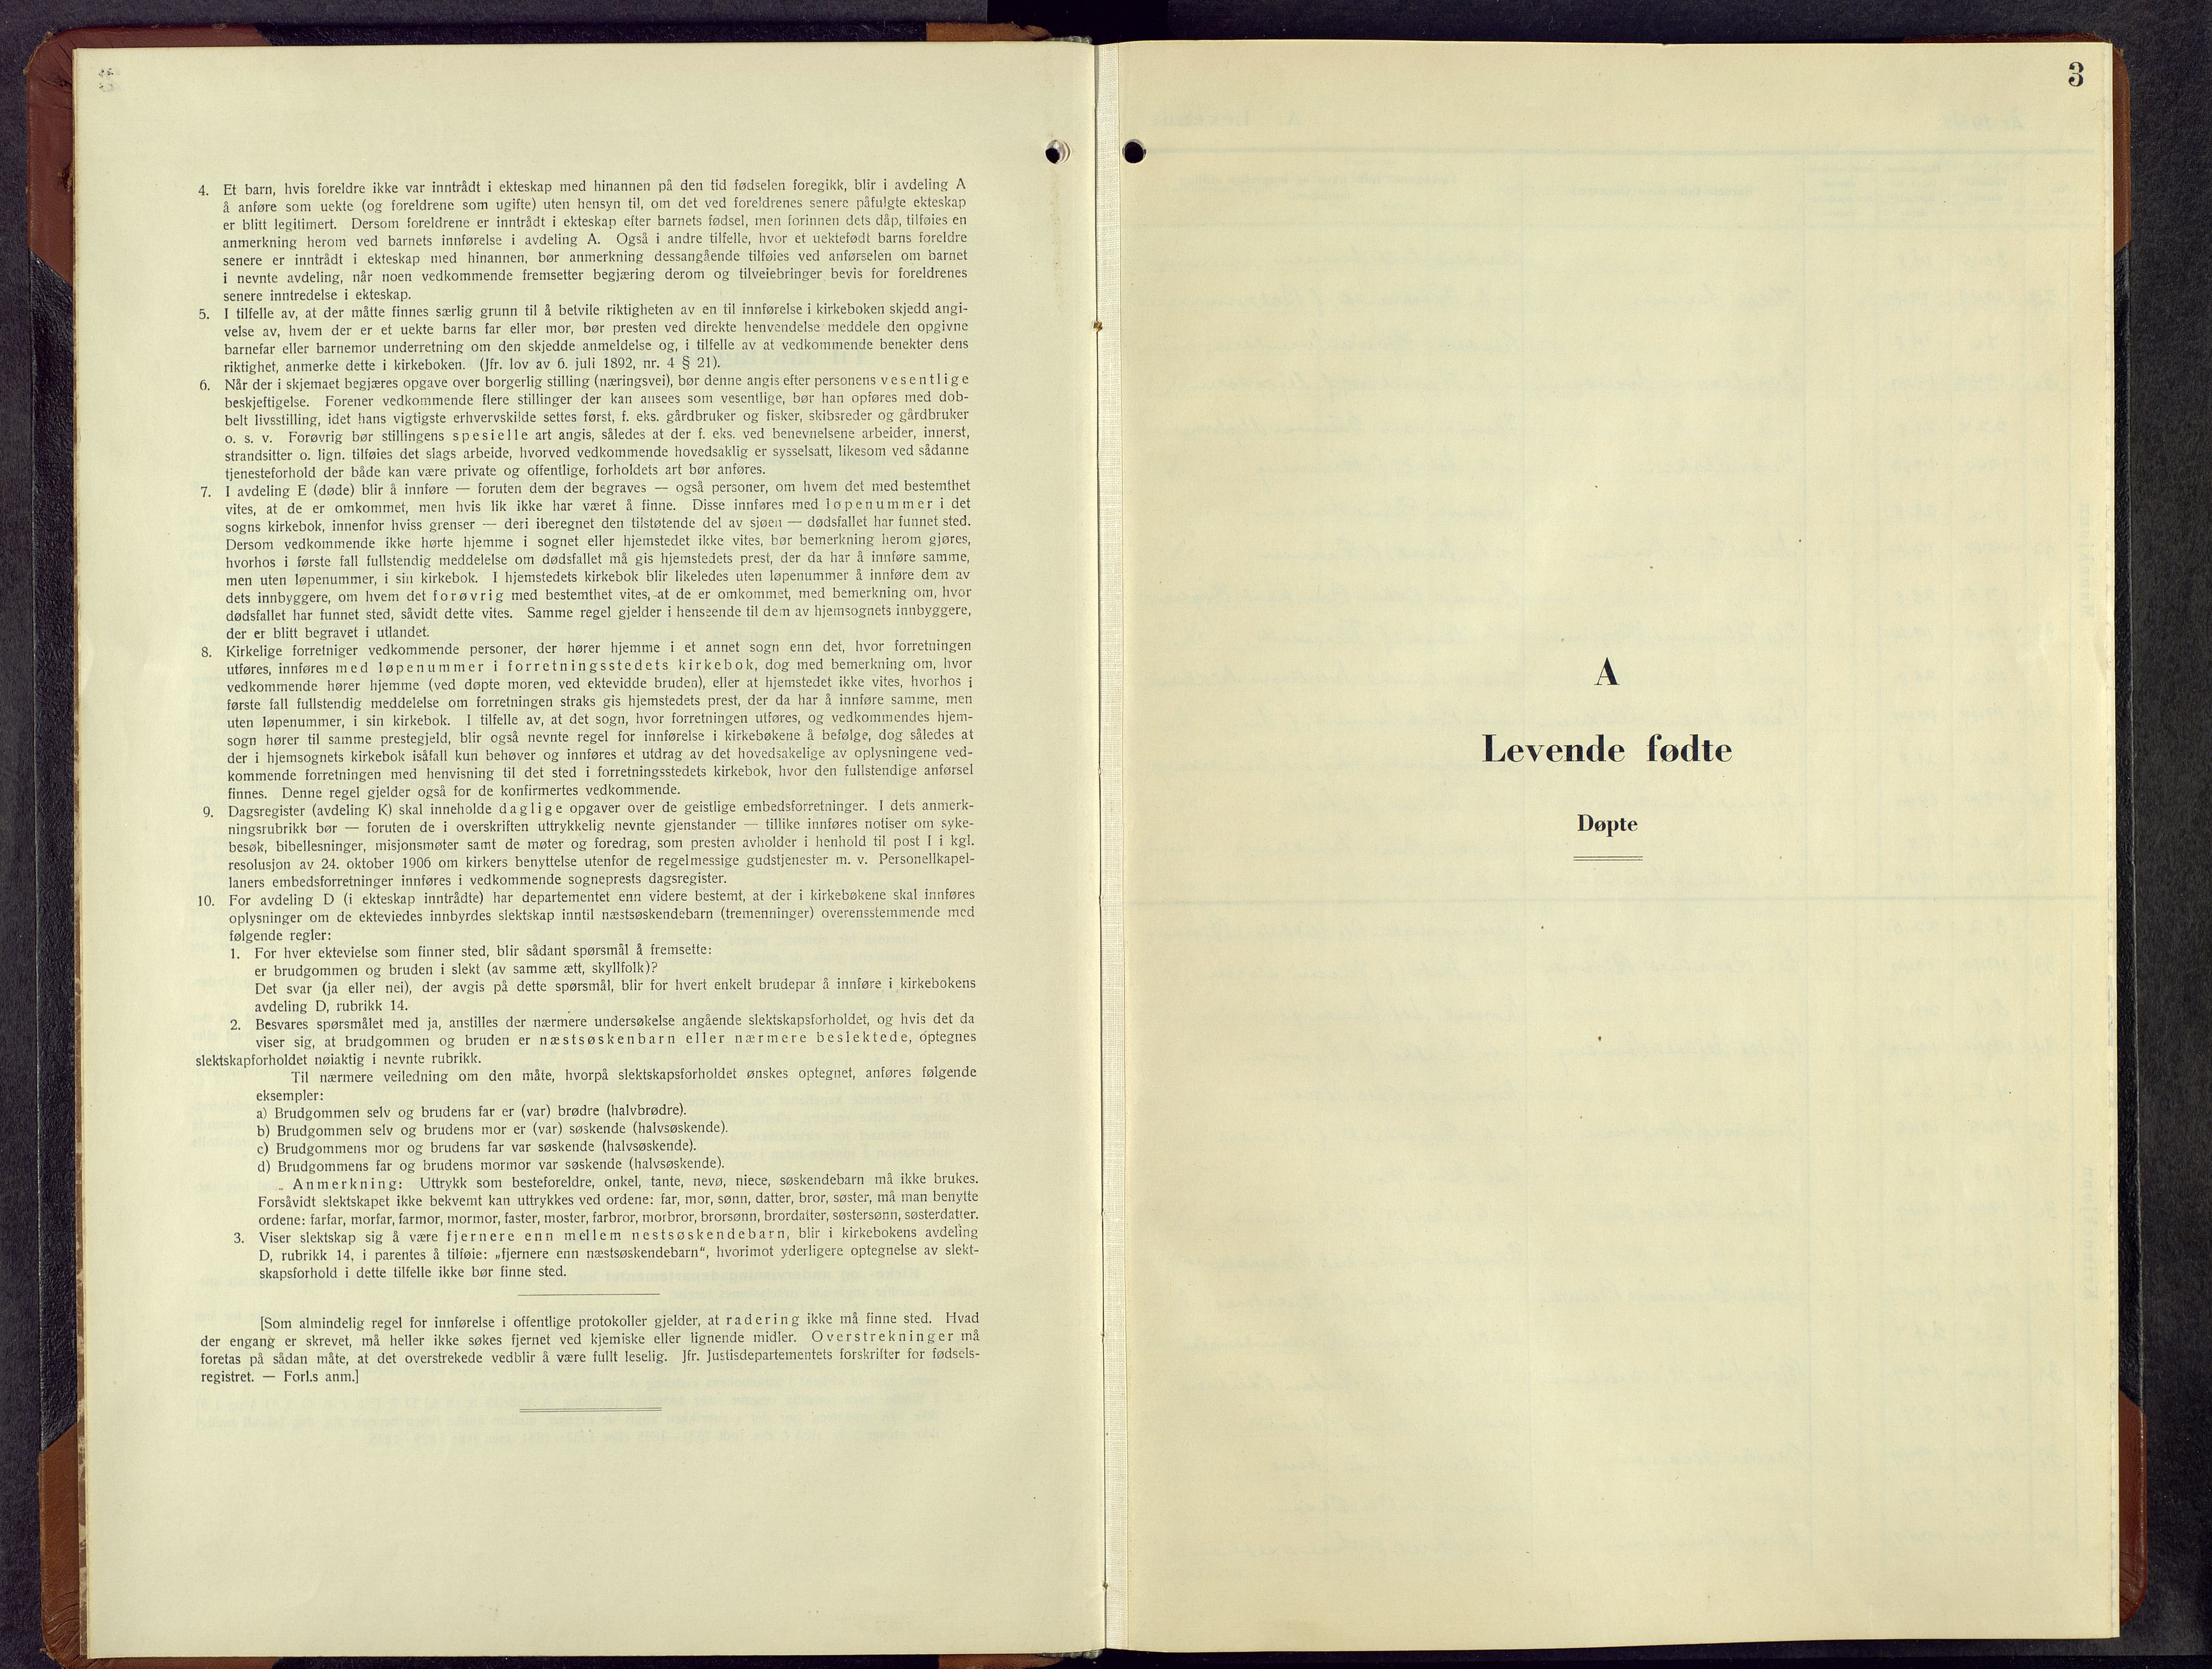 SAH, Fåberg prestekontor, H/Ha/Hab/L0019: Parish register (copy) no. 19, 1949-1968, p. 3